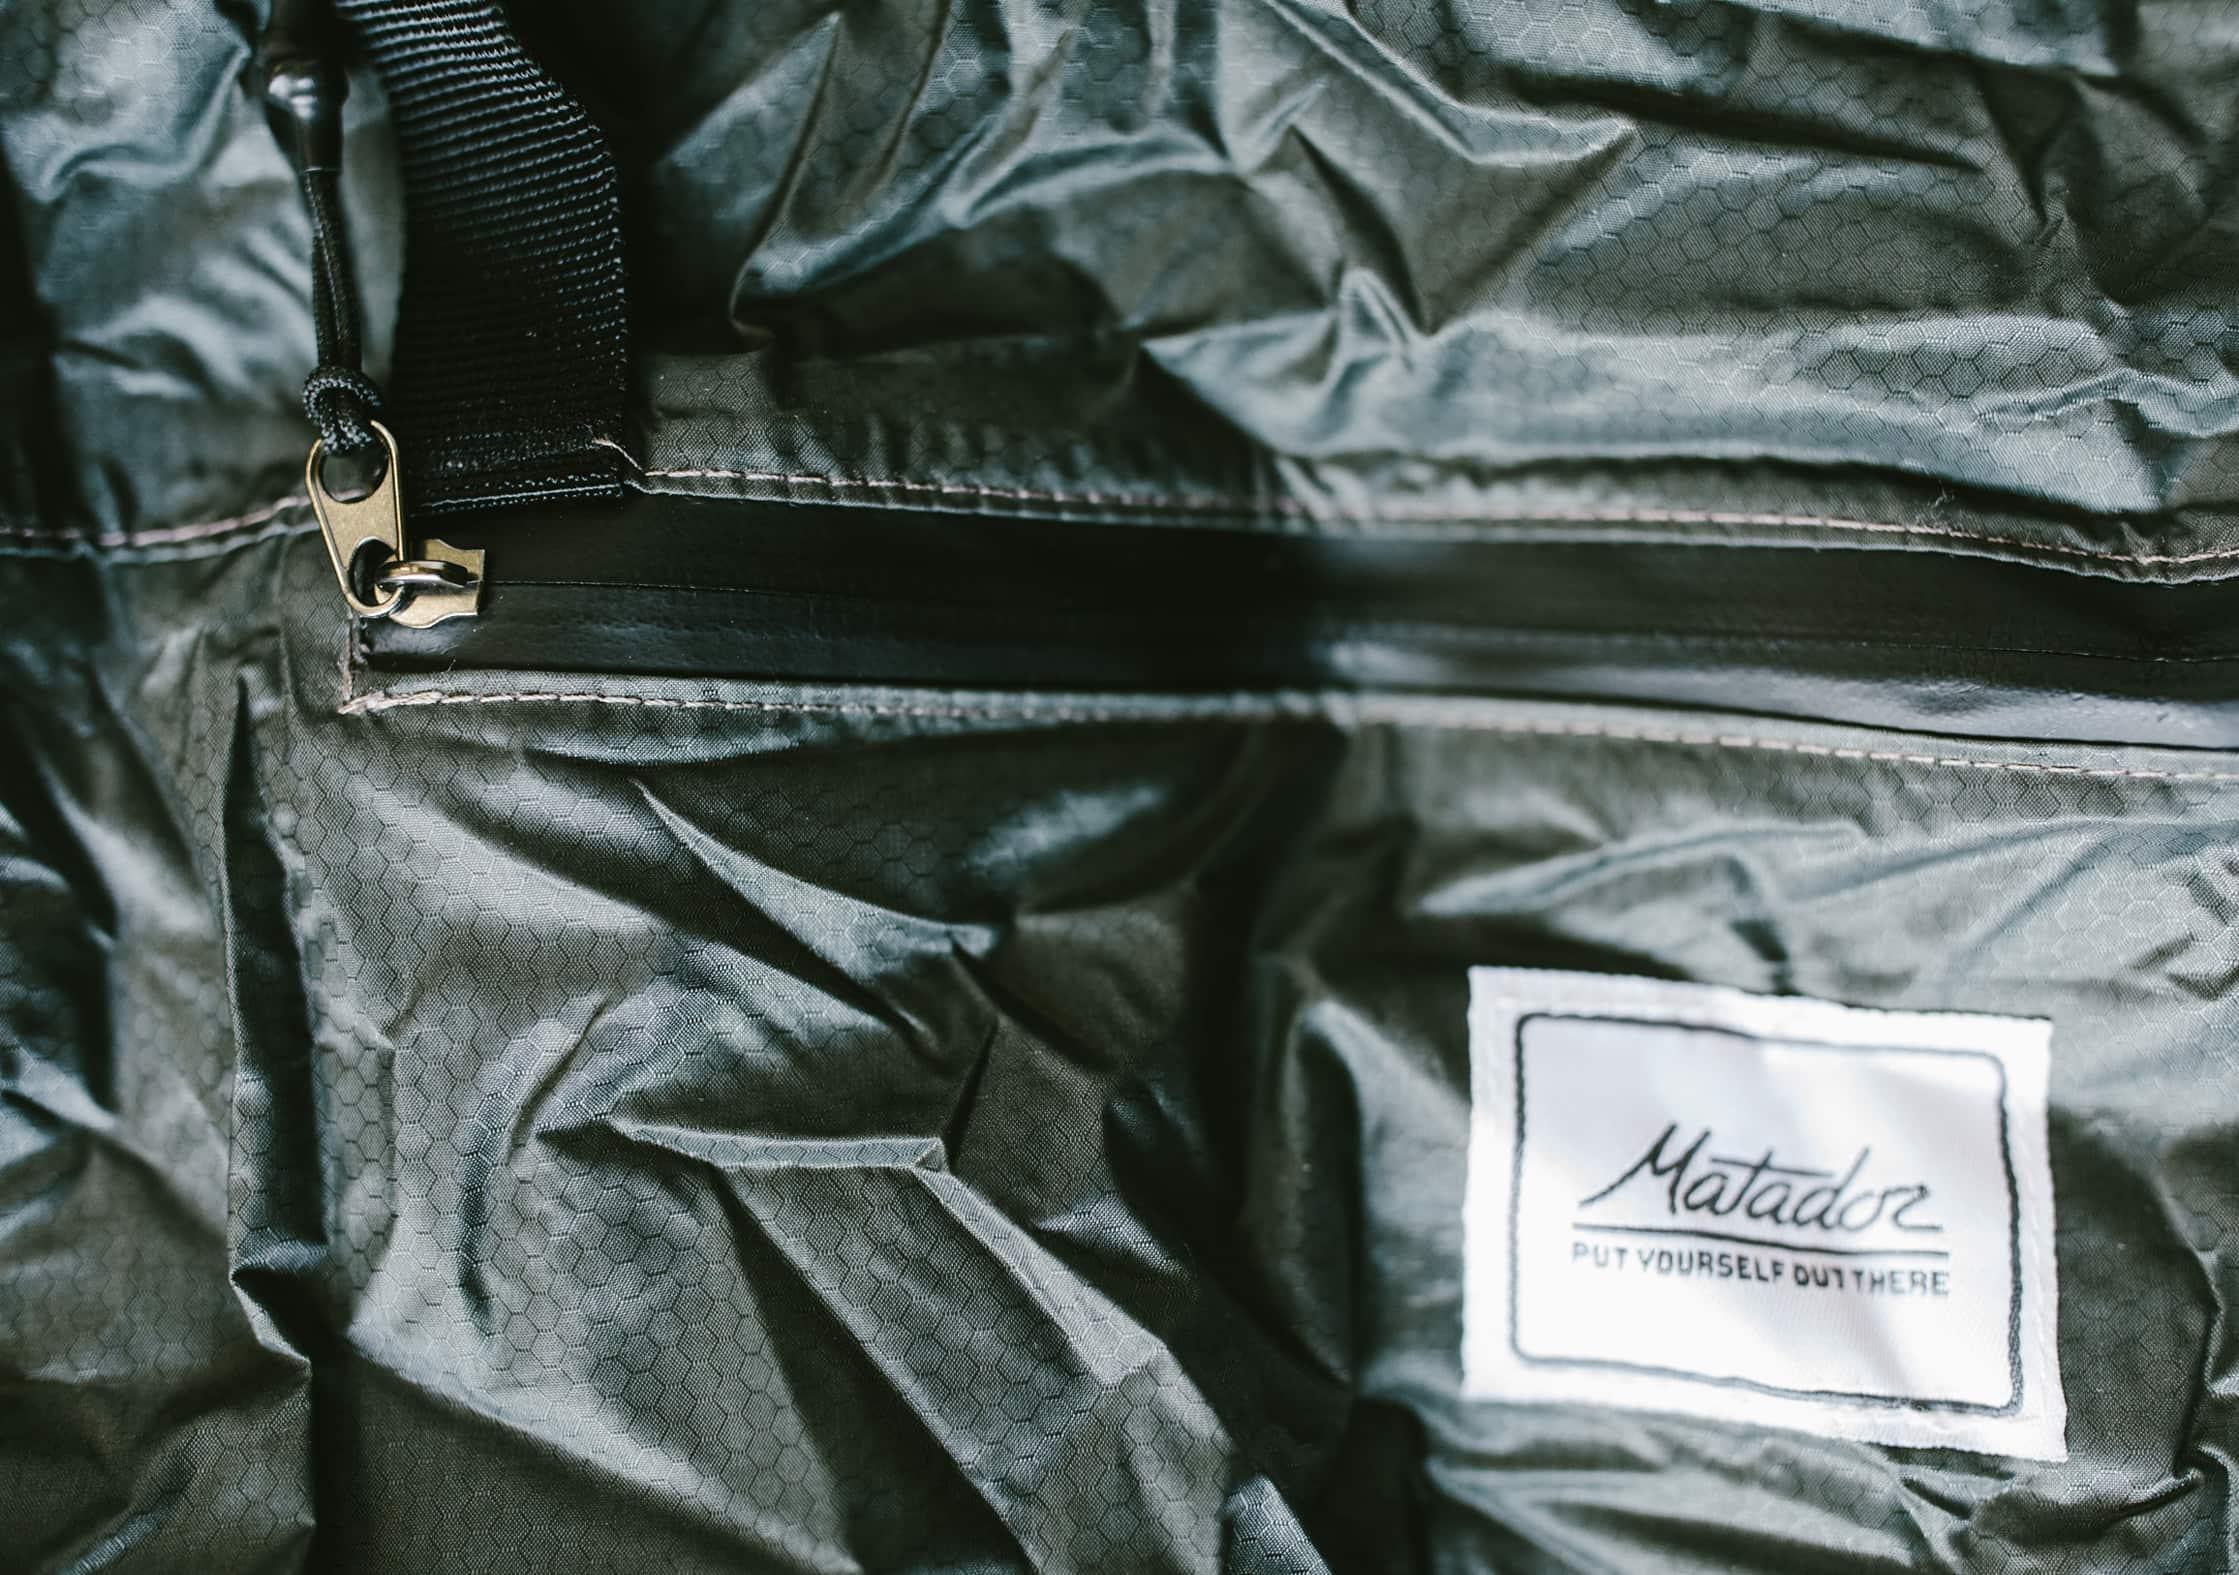 Matador Transit Tote Bag Water Resistant Zipper Close Up